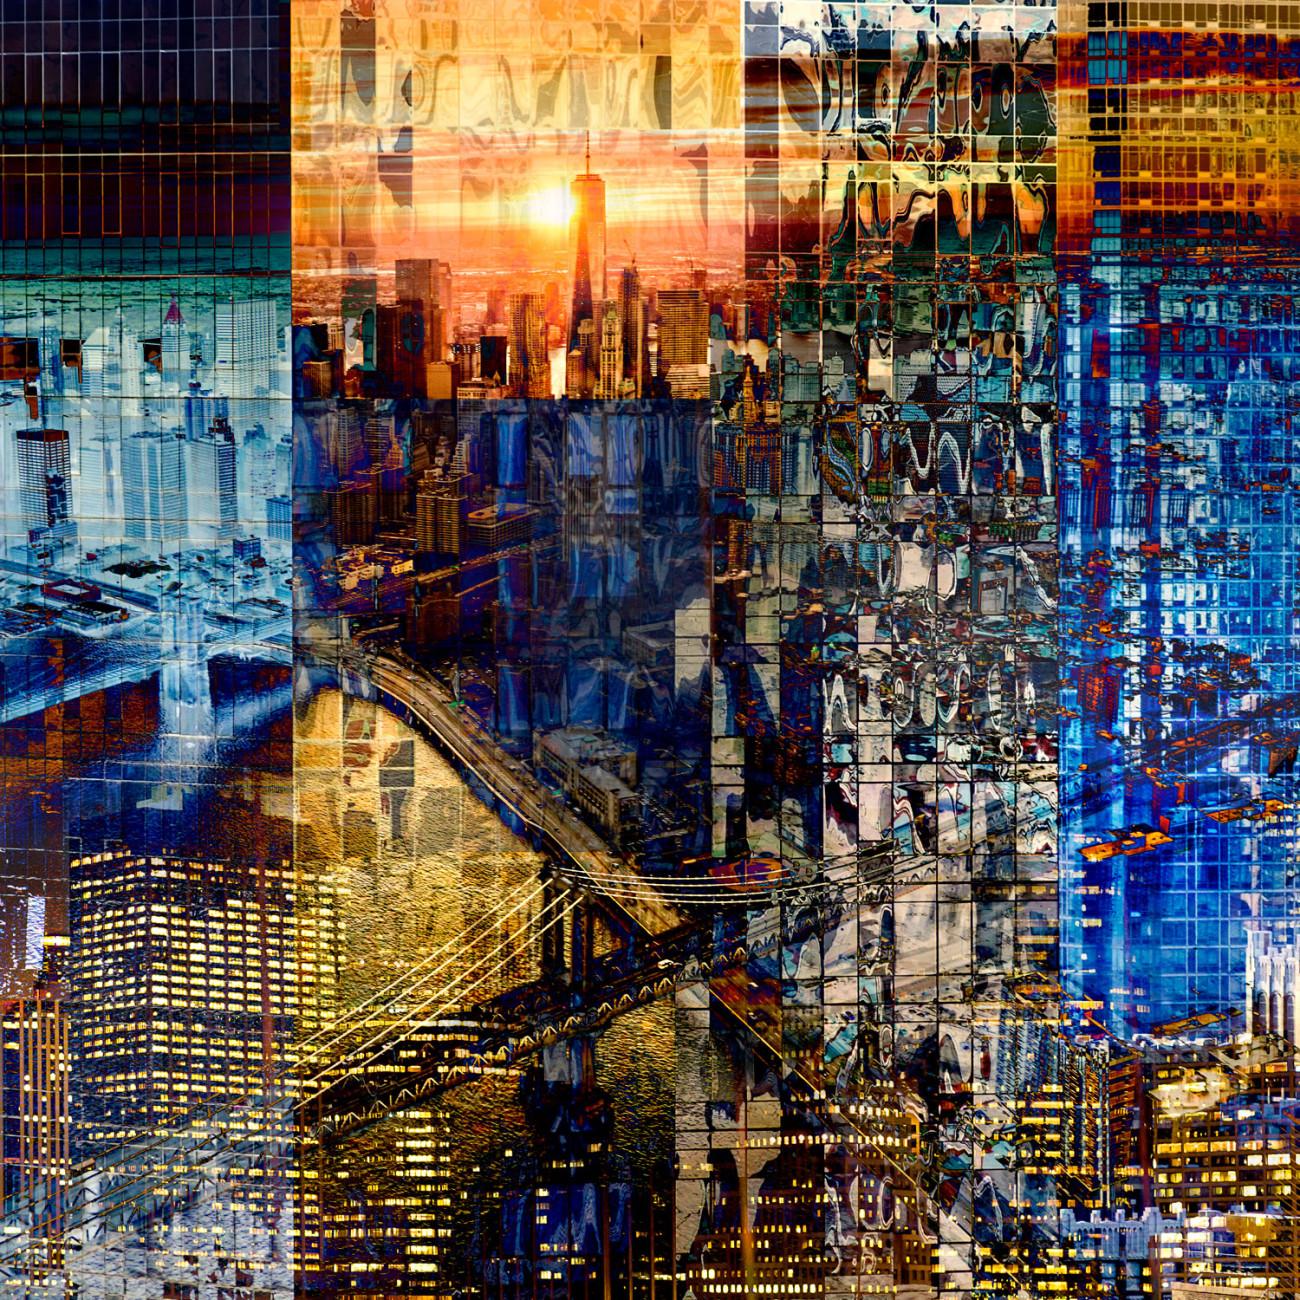 Metropolis - Through the looking glass, 2015